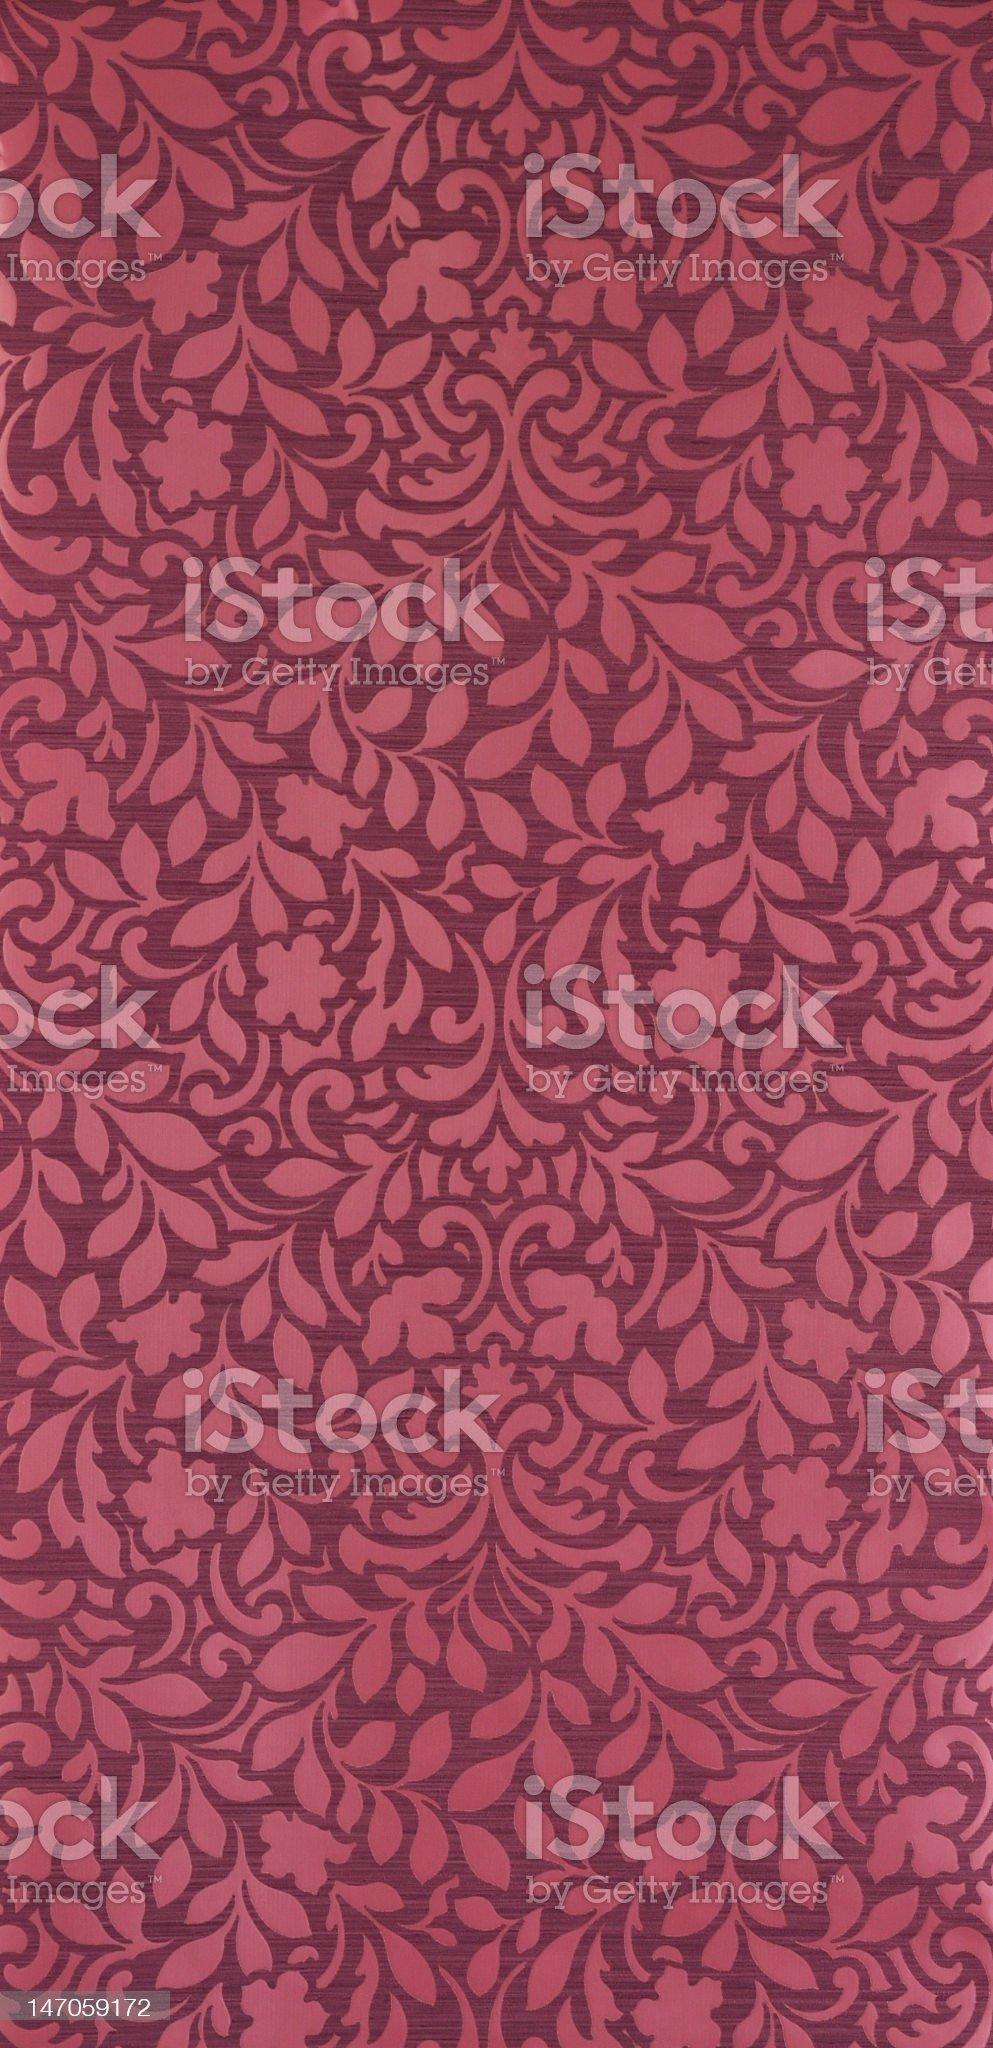 Martin floral pattern wallpaper royalty-free stock photo